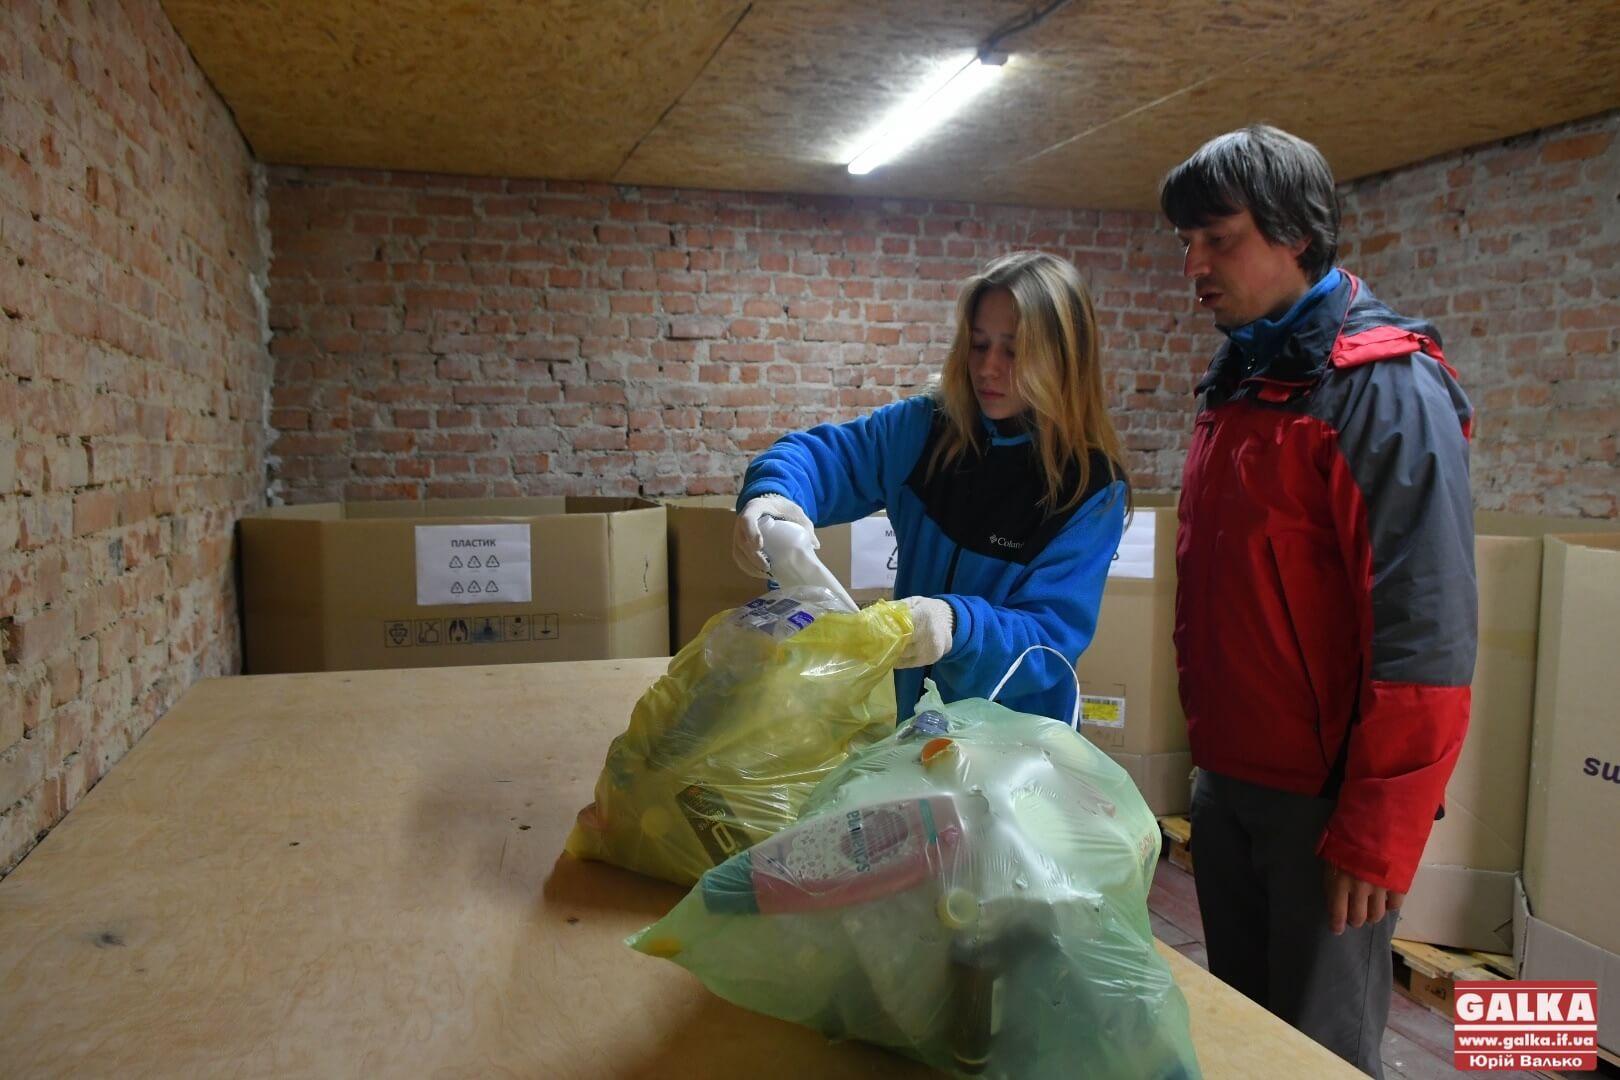 Папір, пластик, метал: в Івано-Франківську запрацювала сортувальна станція (ФОТО)